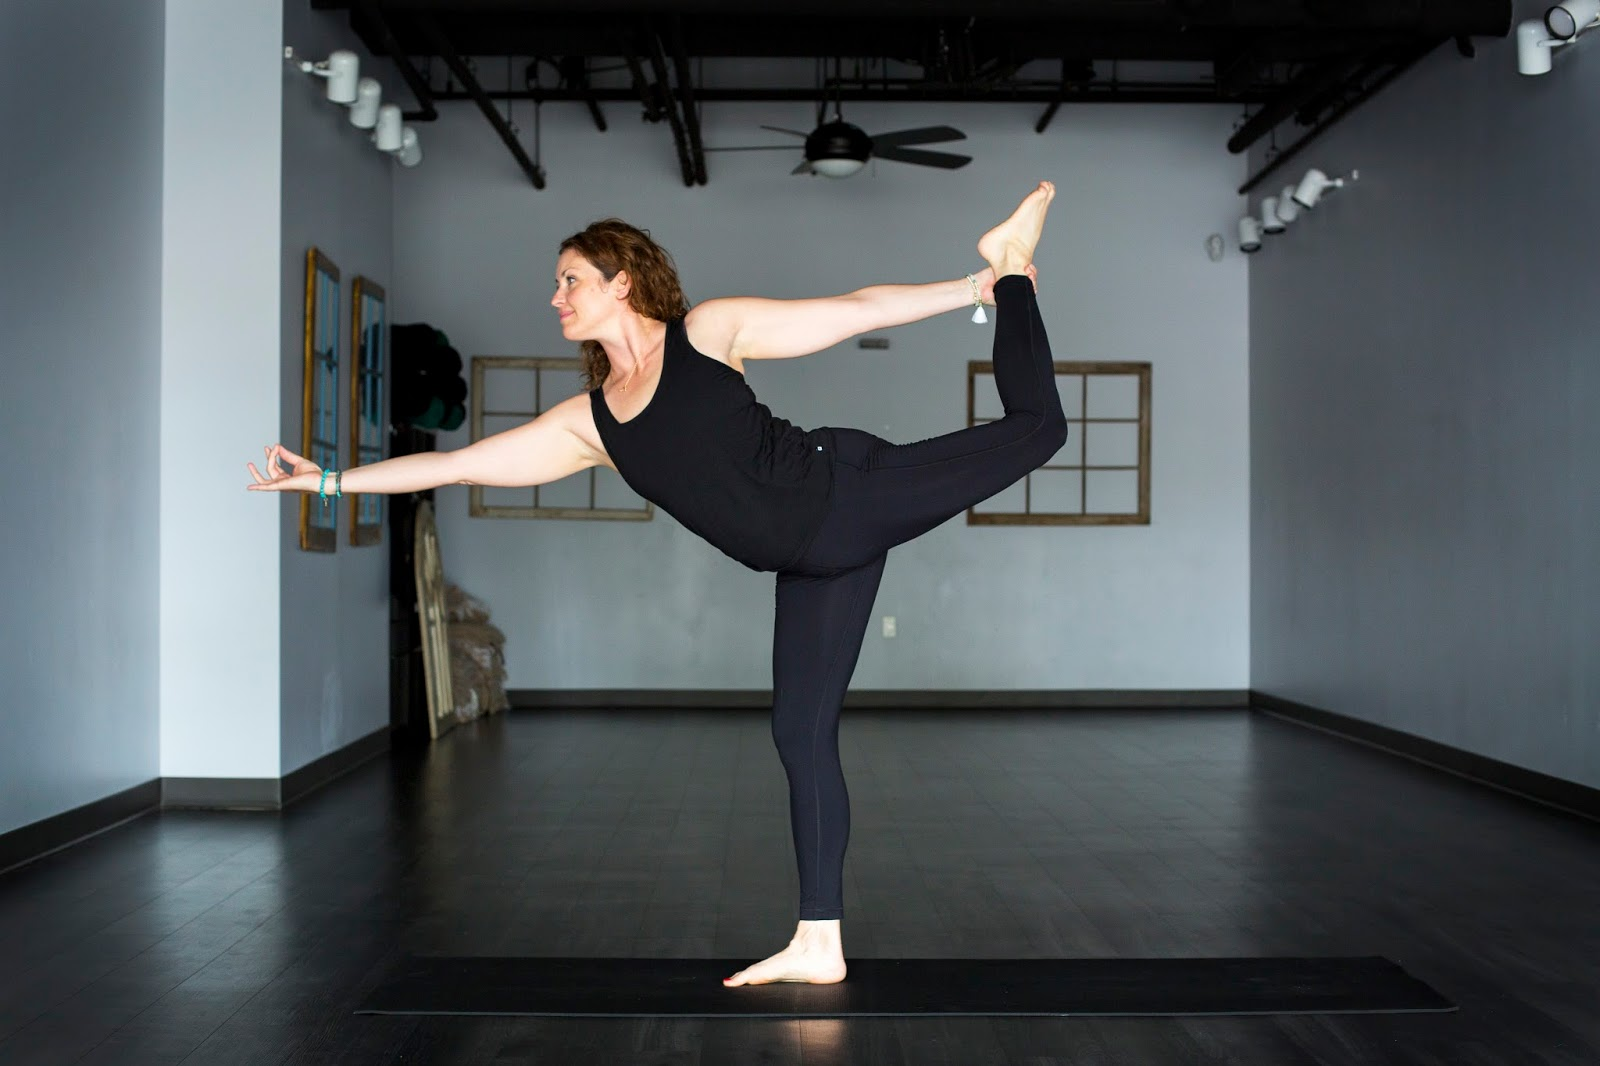 amy-pollok-dc-yoga-photography-3